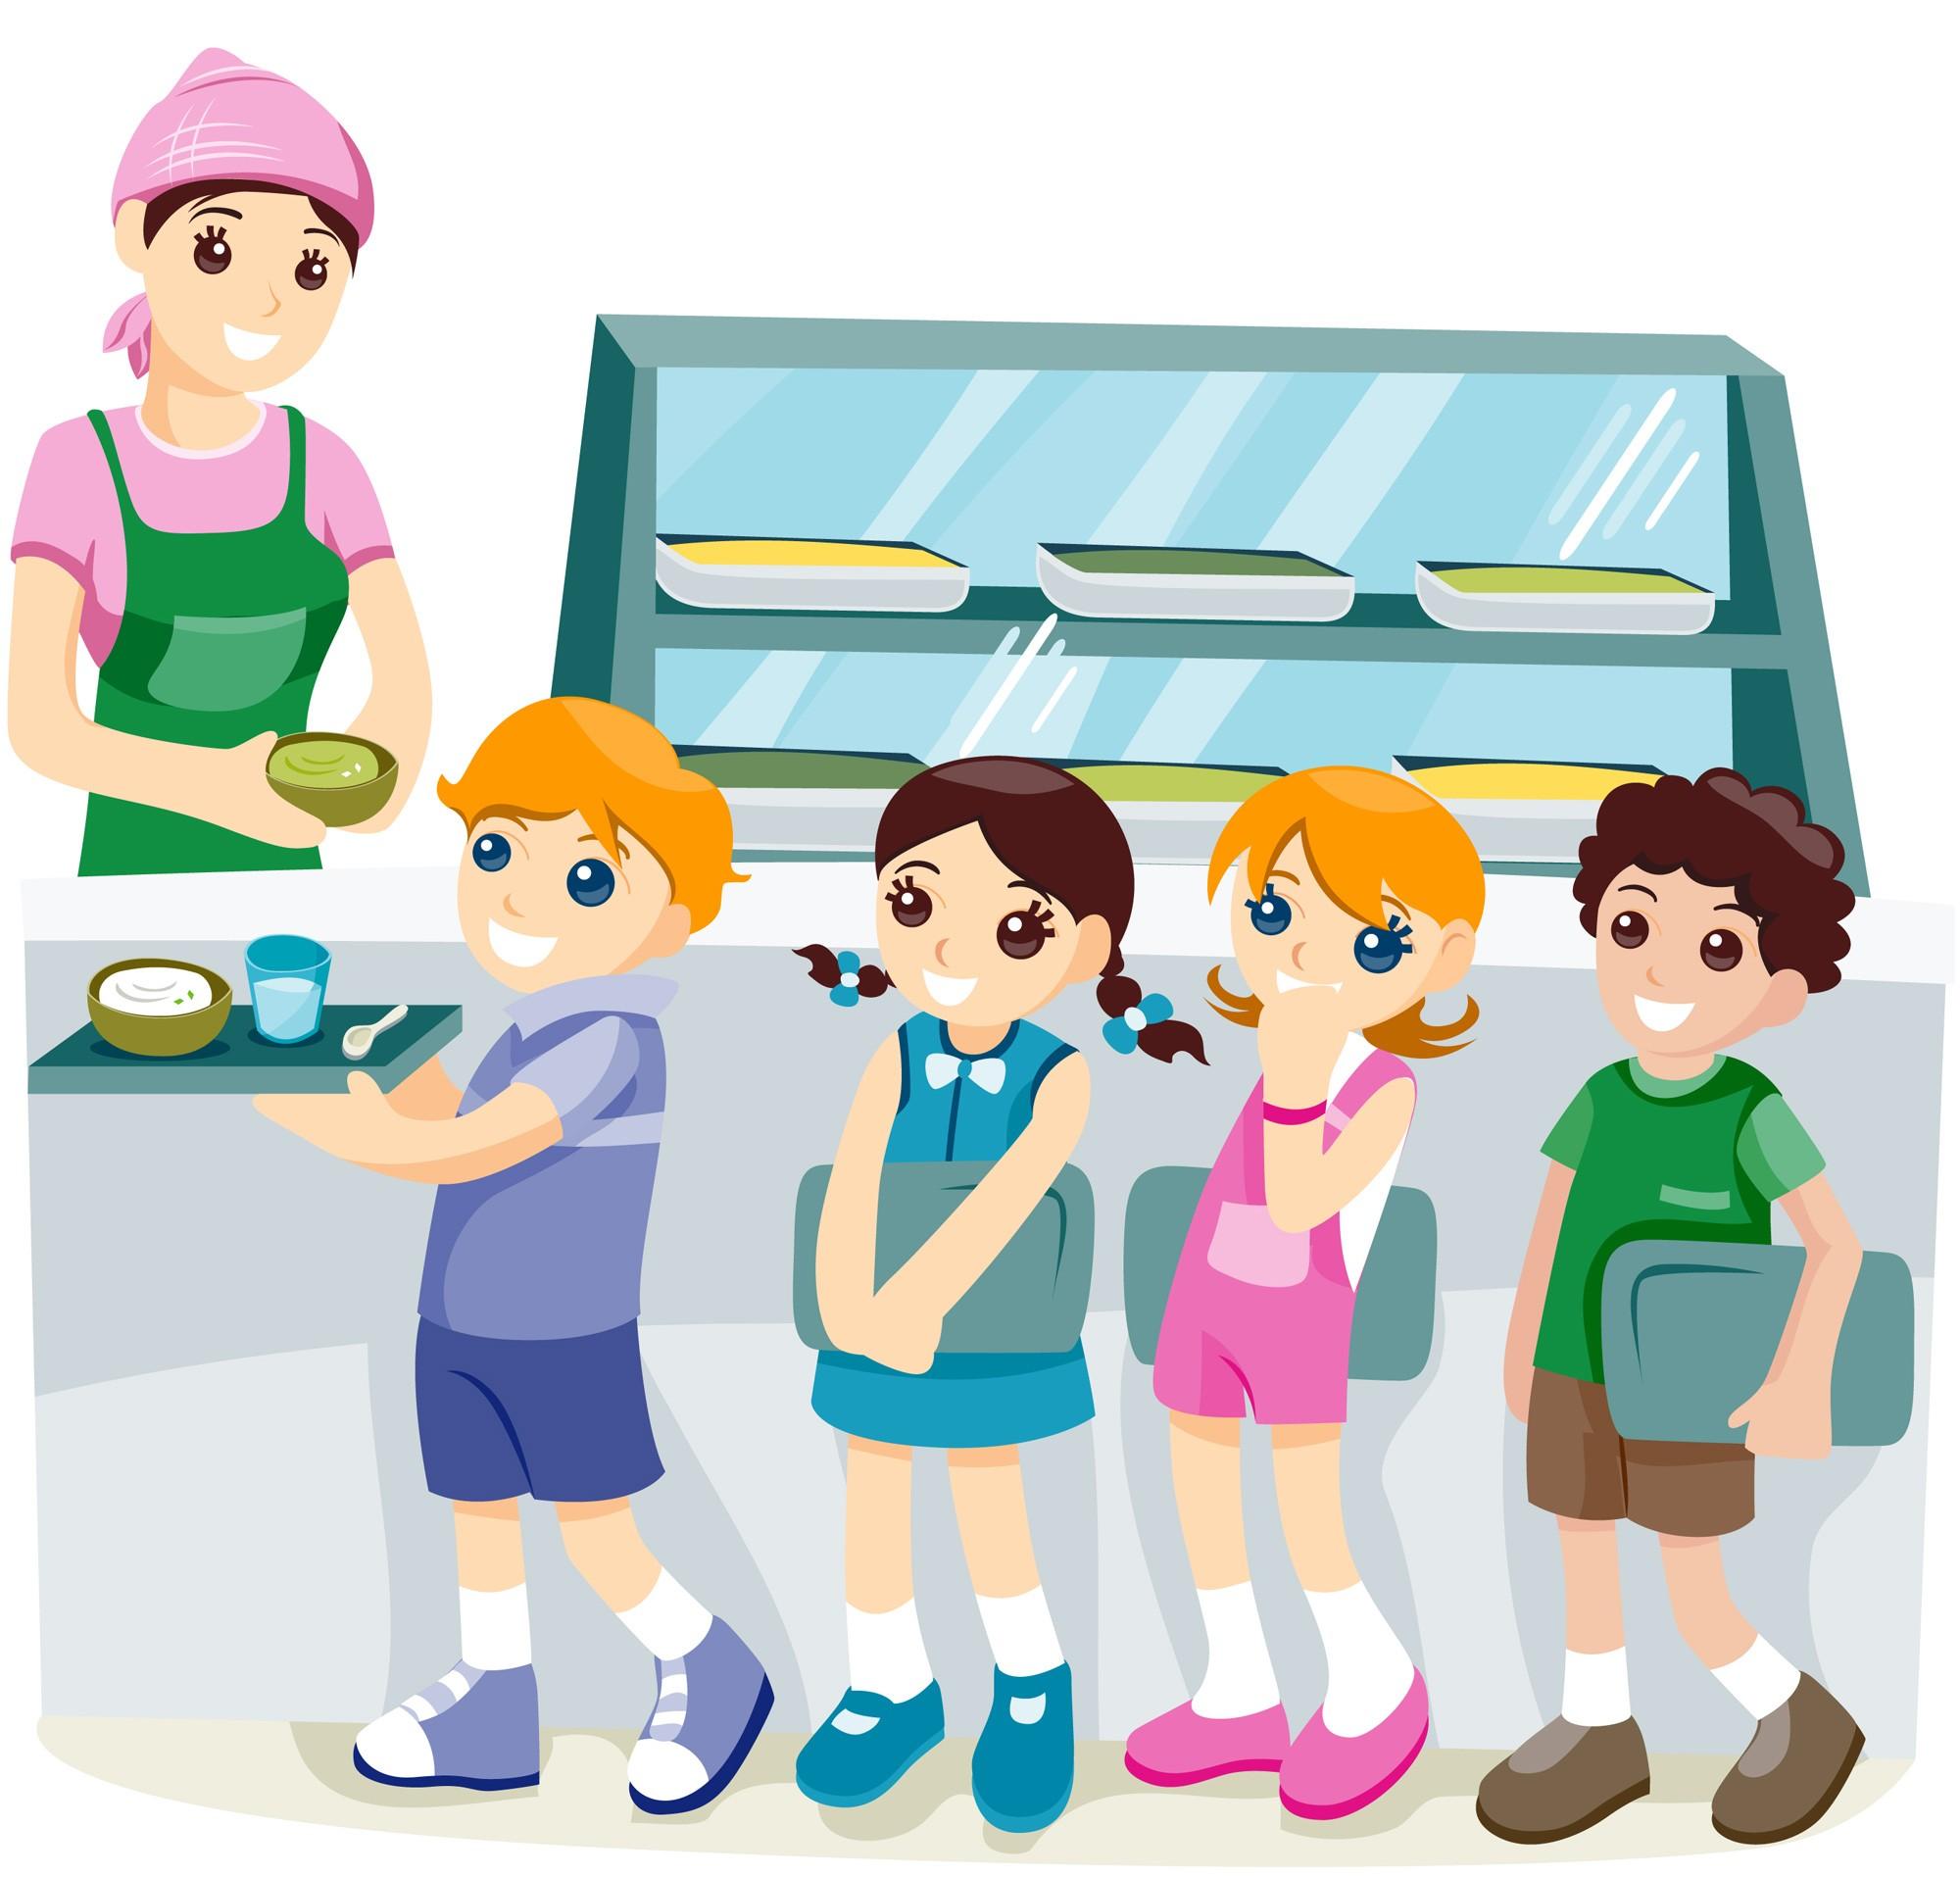 Kids in Lunchroom Illustration